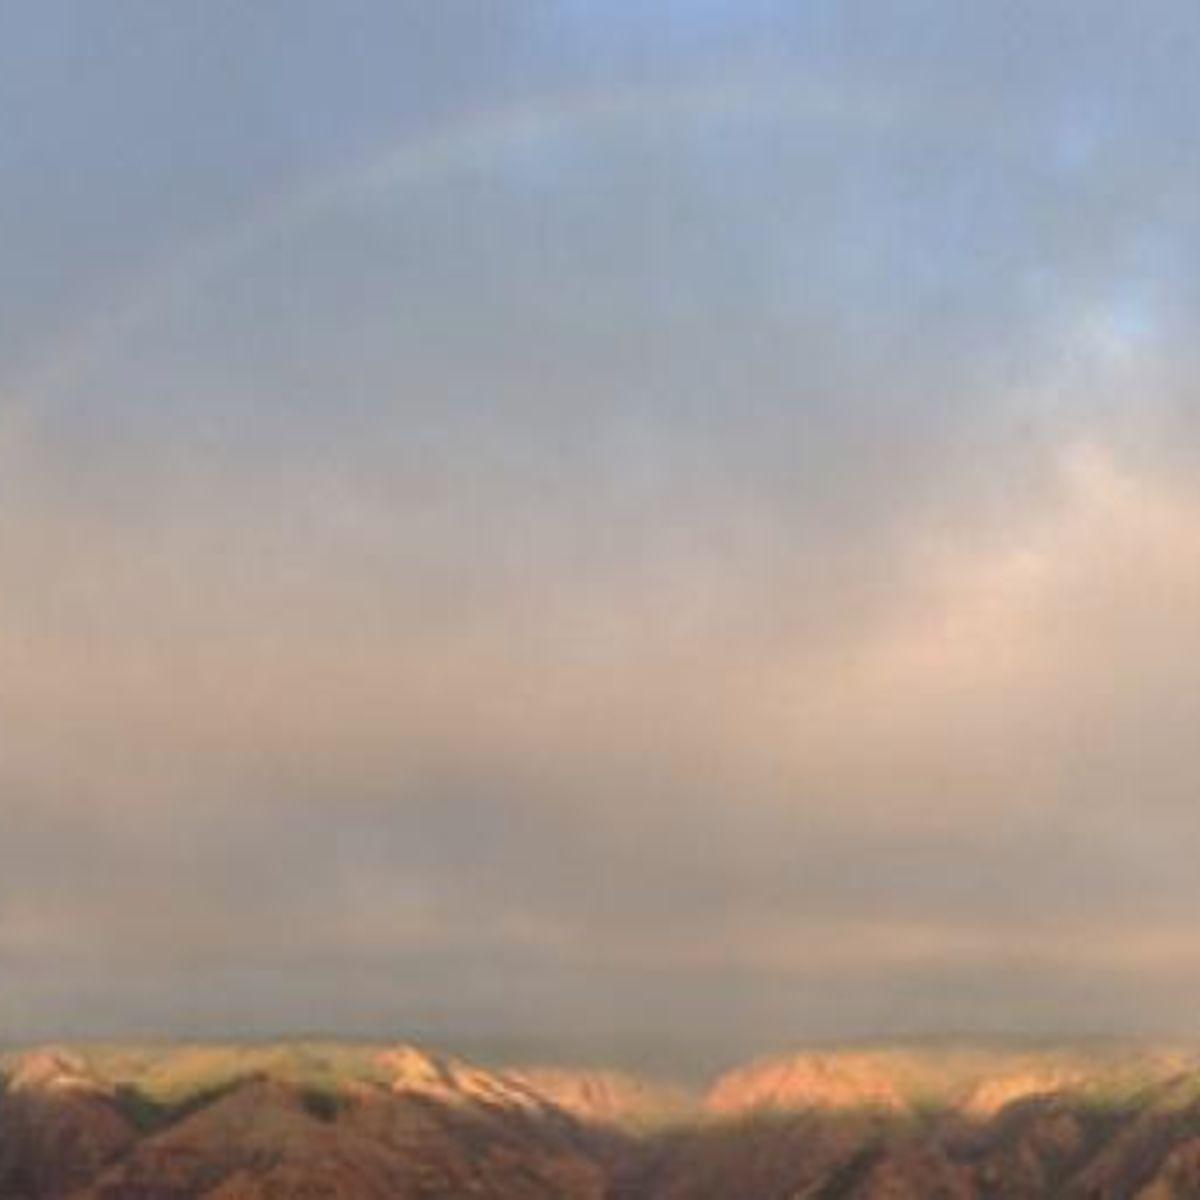 rickmann_rainbow.jpg.CROP.rectangle-large.jpg